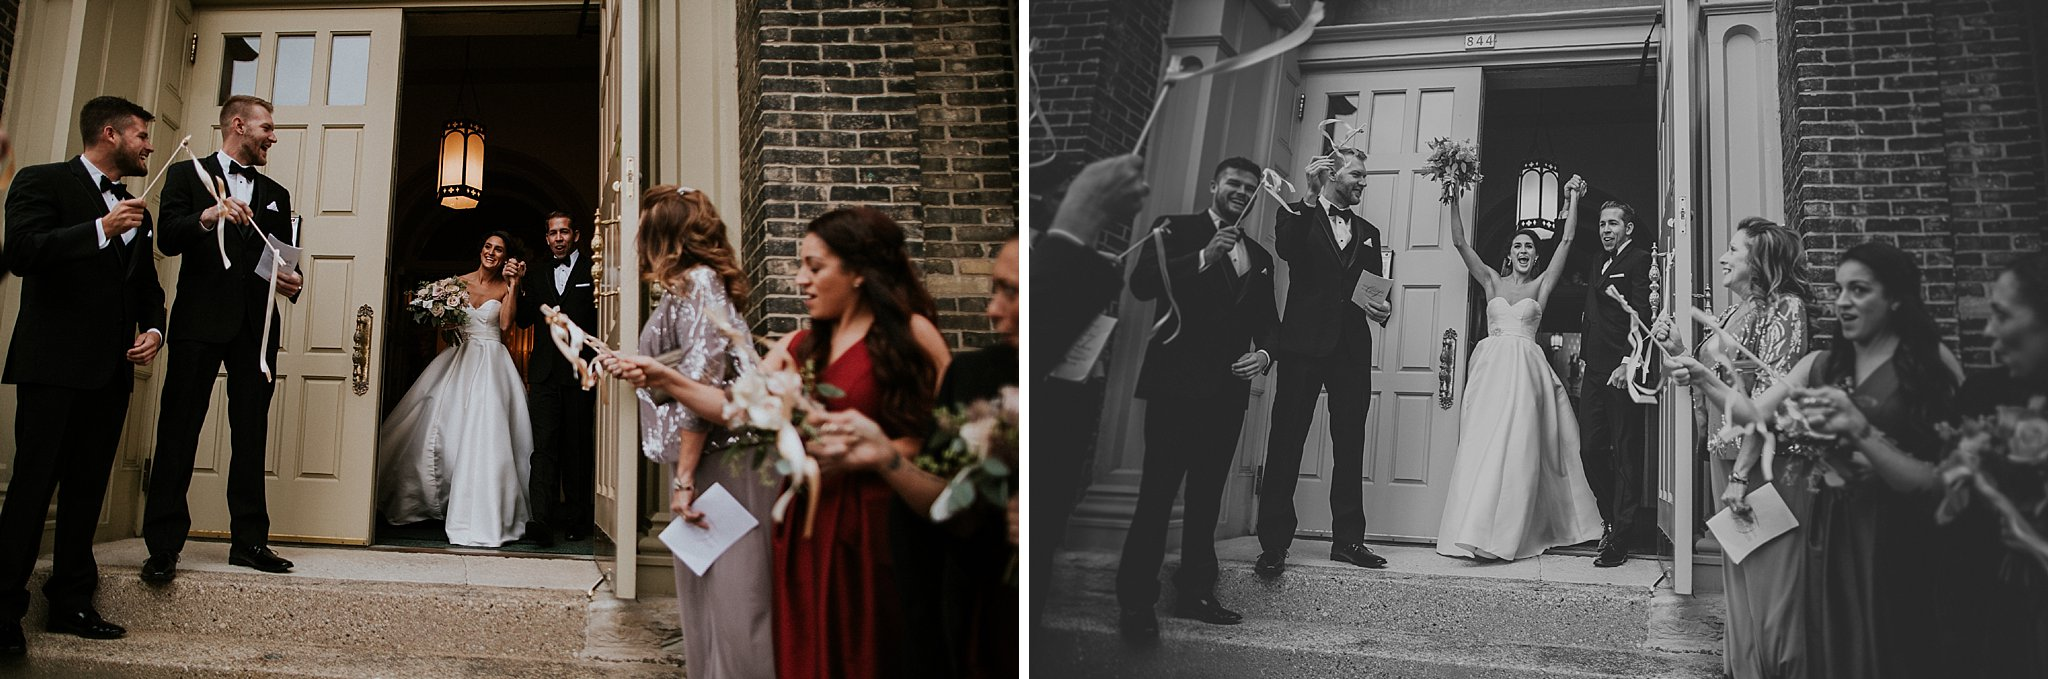 Matt-Lauren_St-Marys_Hilton-City-Center-Milwaukee-Wedding_liller-photo_0030.jpg